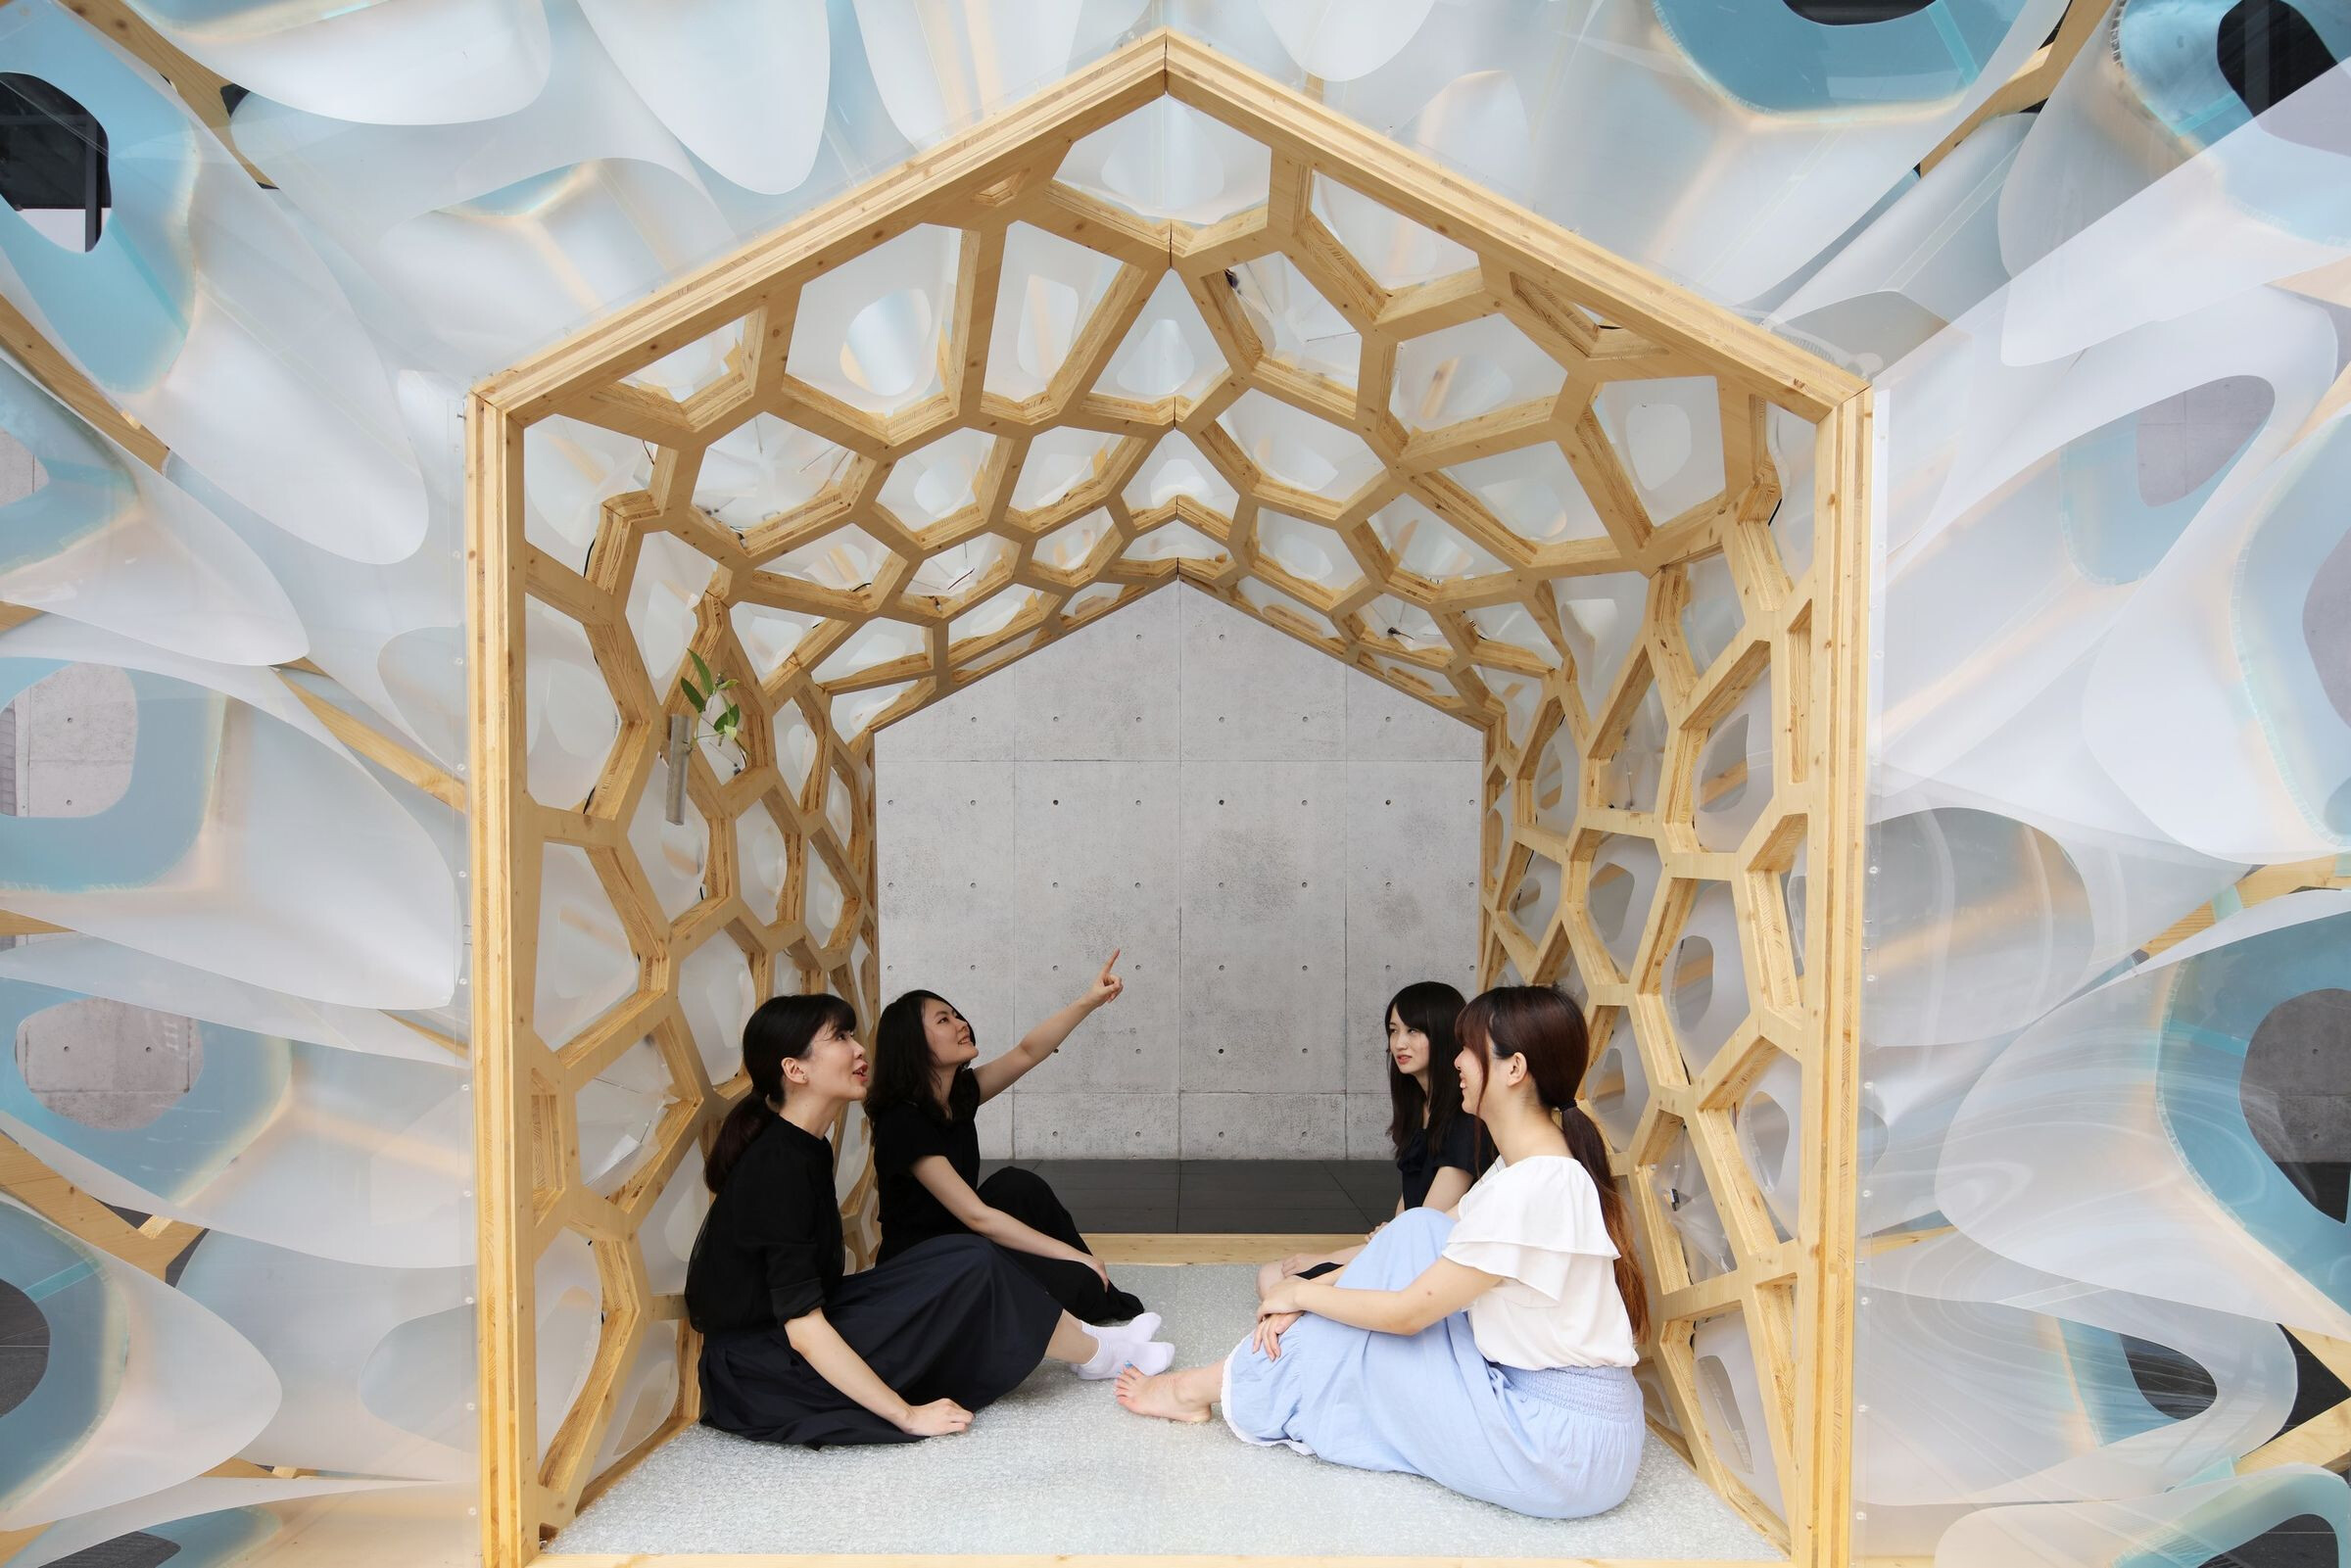 Porous Manifold as a Japanese Tearoom